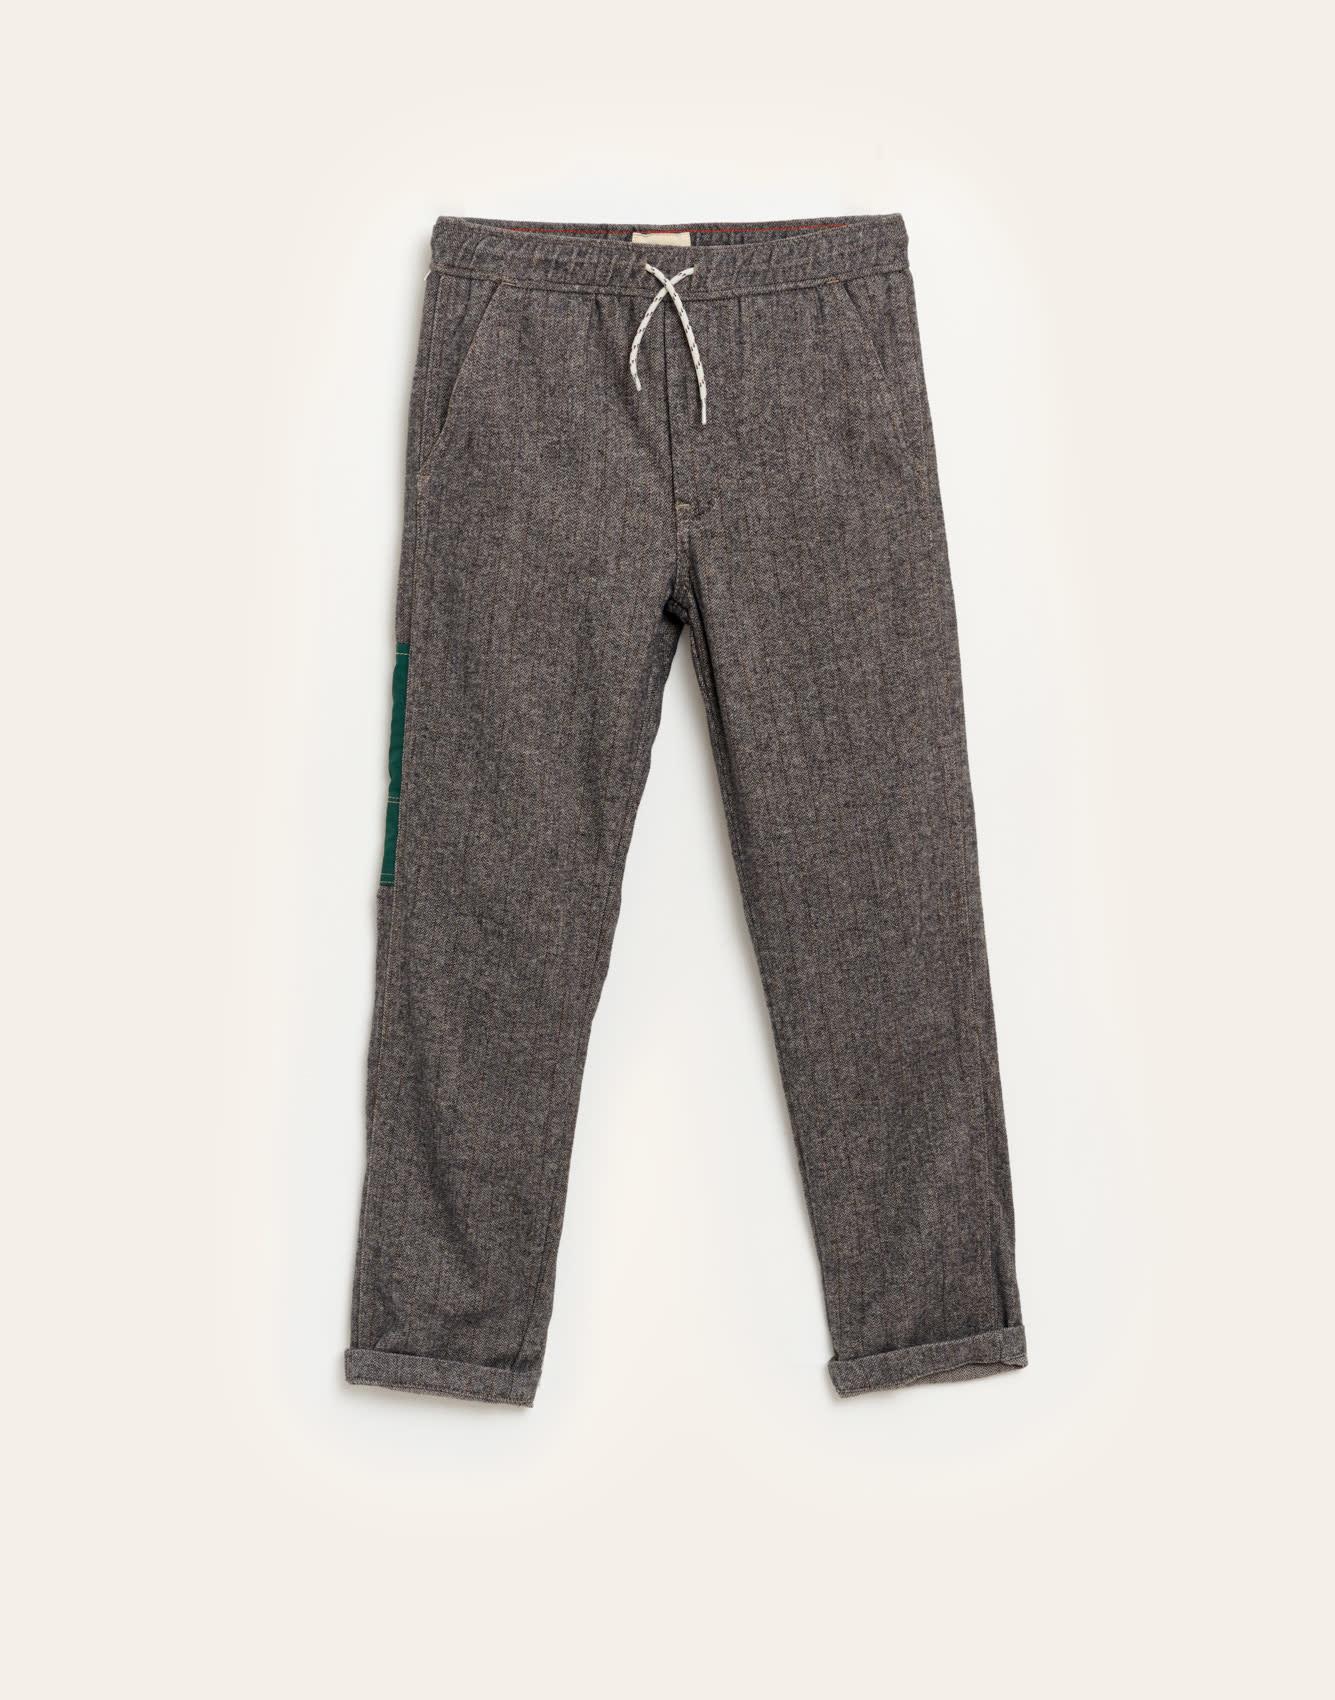 Pants painter stripe-1